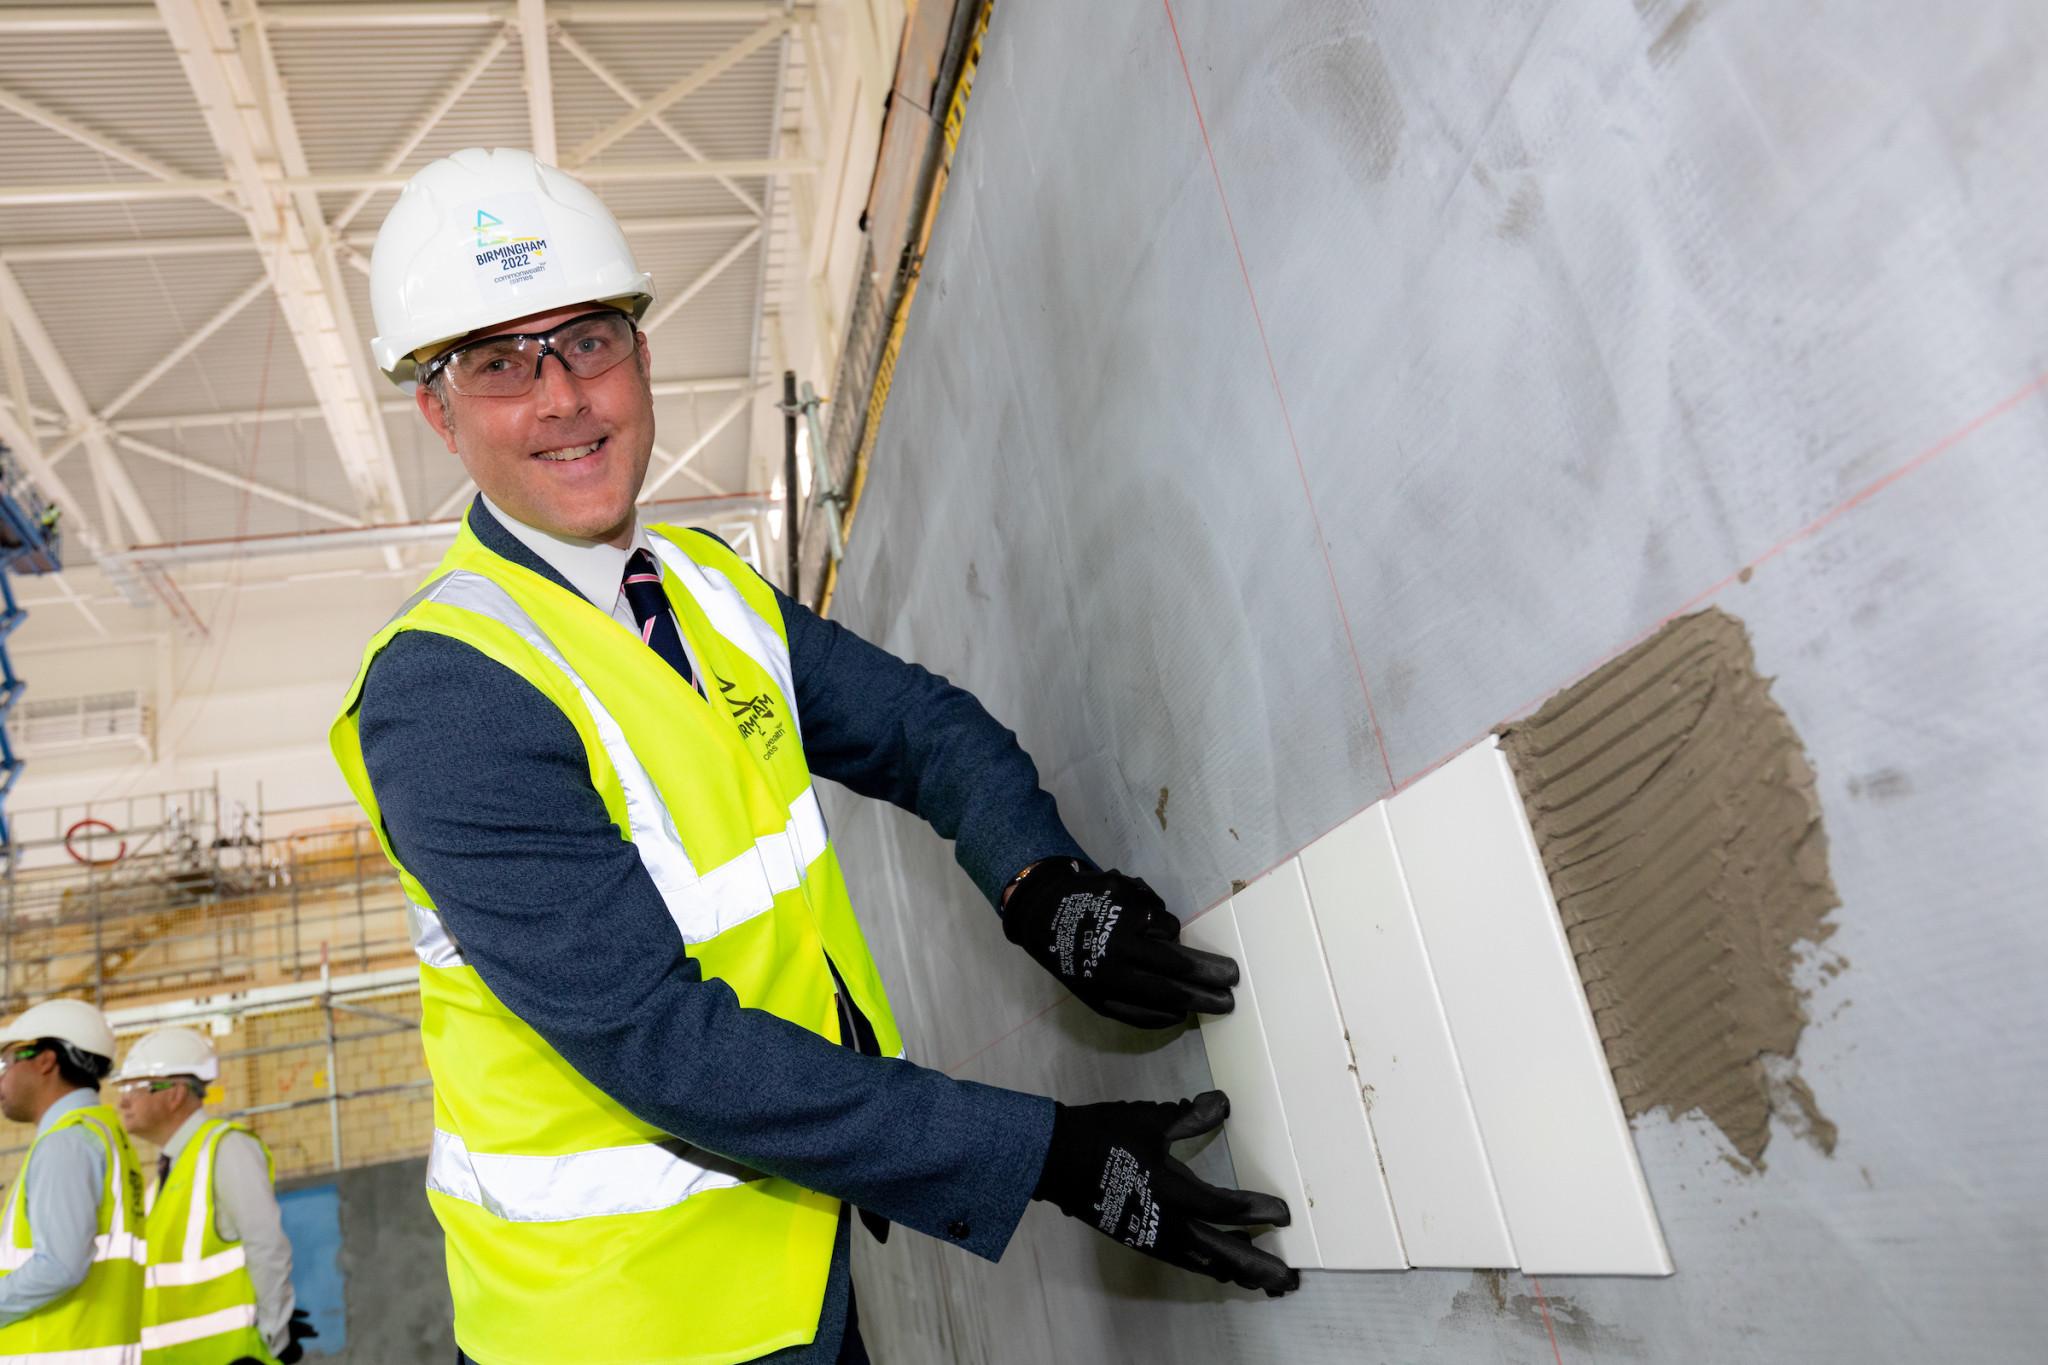 Ian Reid lays the first tiles at the Sandwell Aquatics Centre ©Birmingham 2022